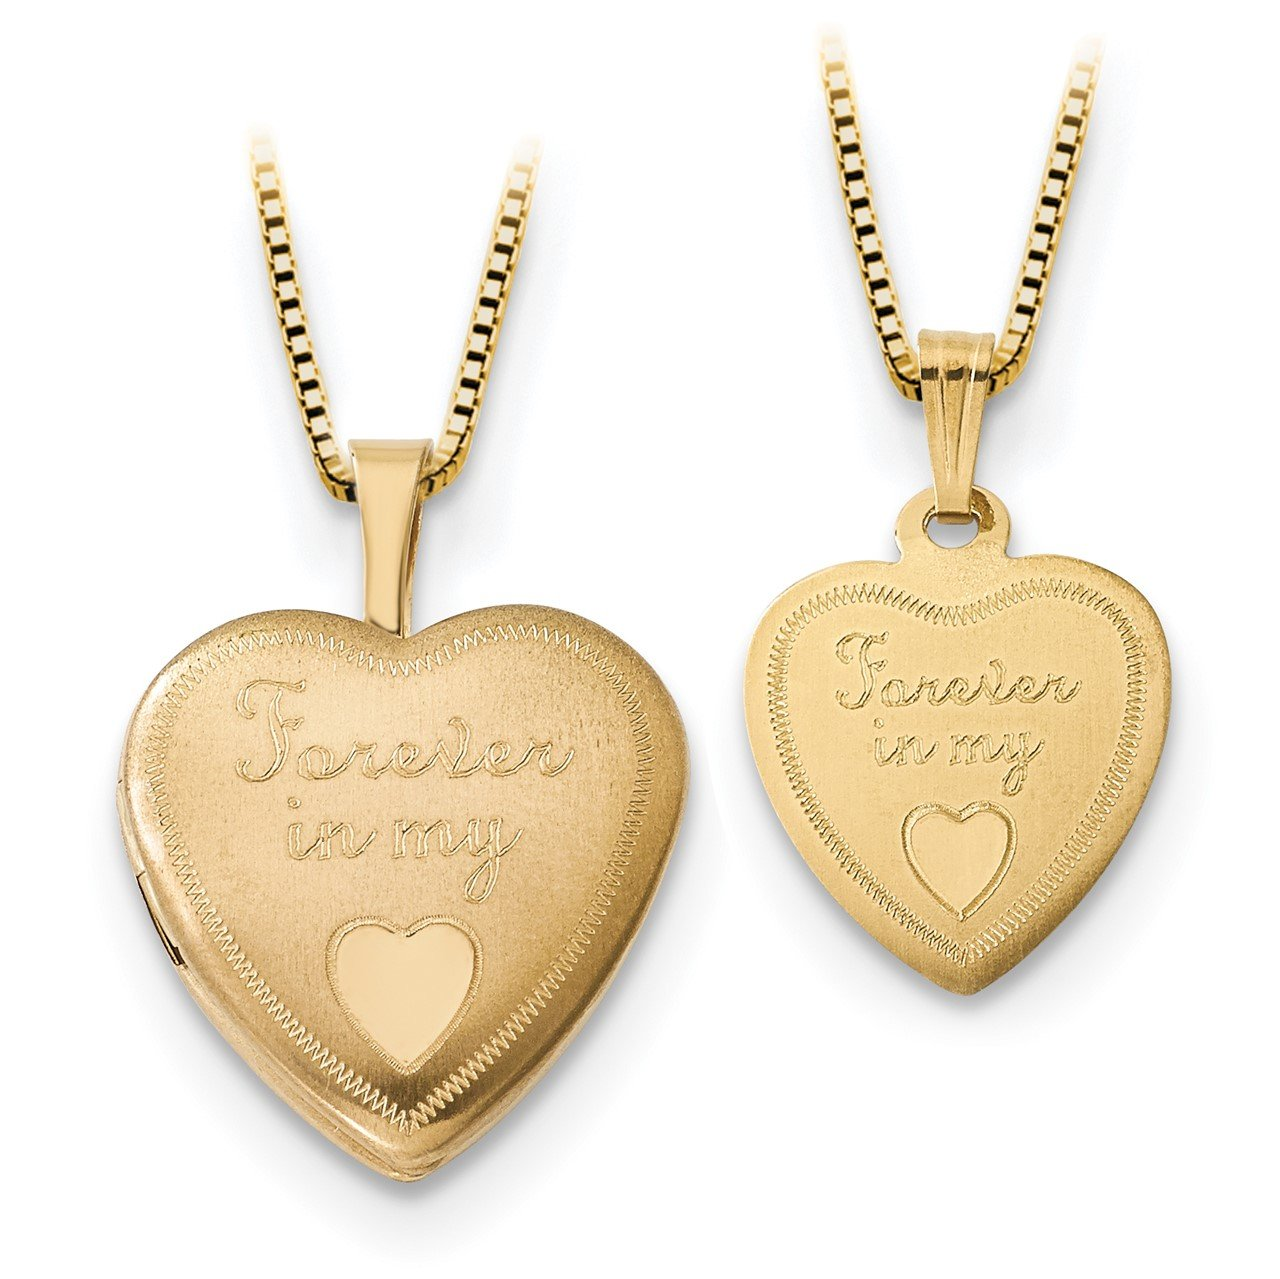 14K 16mm Forever in Heart Locket/Gold-plated Sterling 12mm Pendant